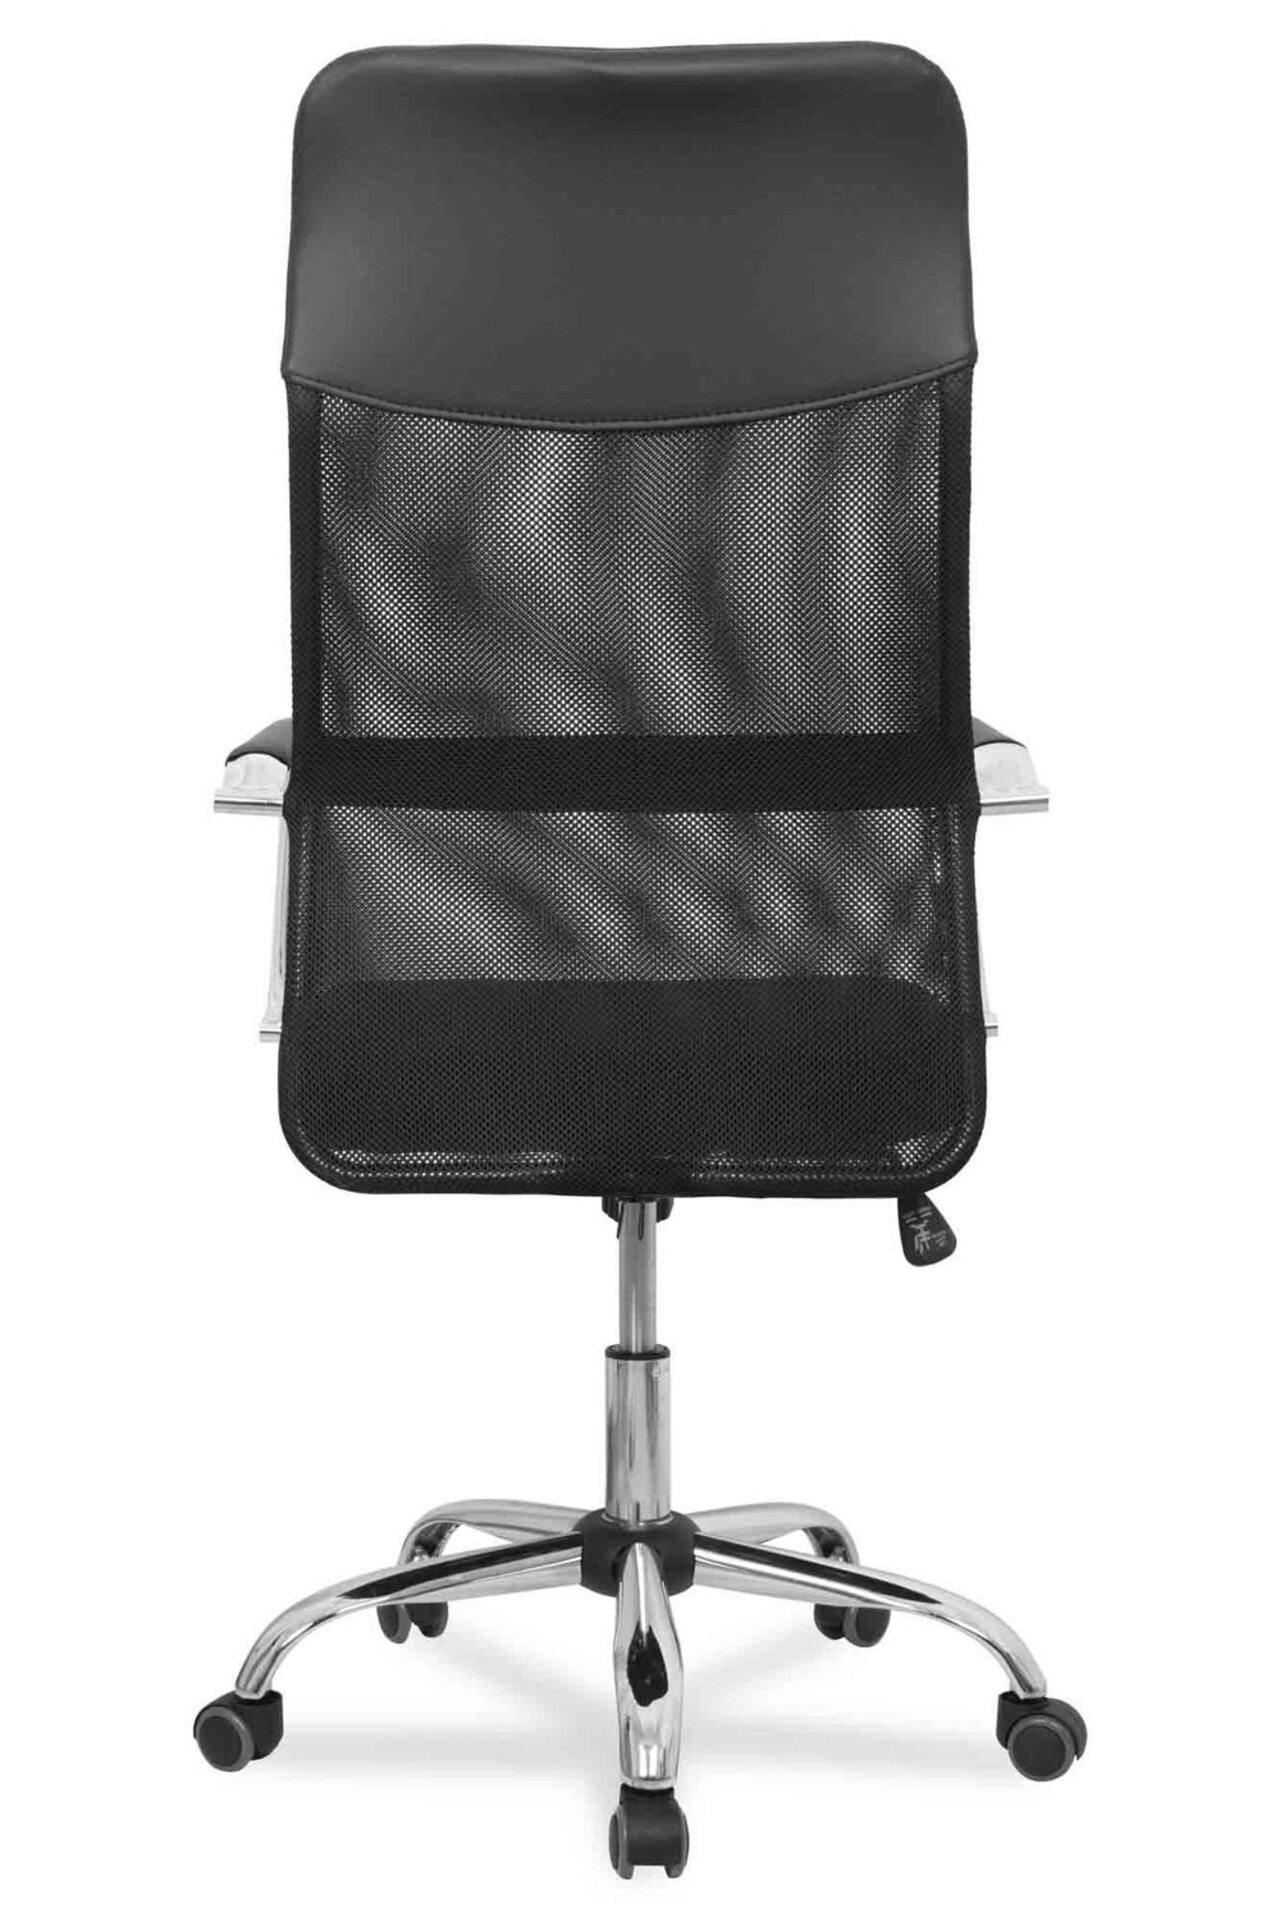 Кресло руководителя College CLG-419 MХН - фото 3